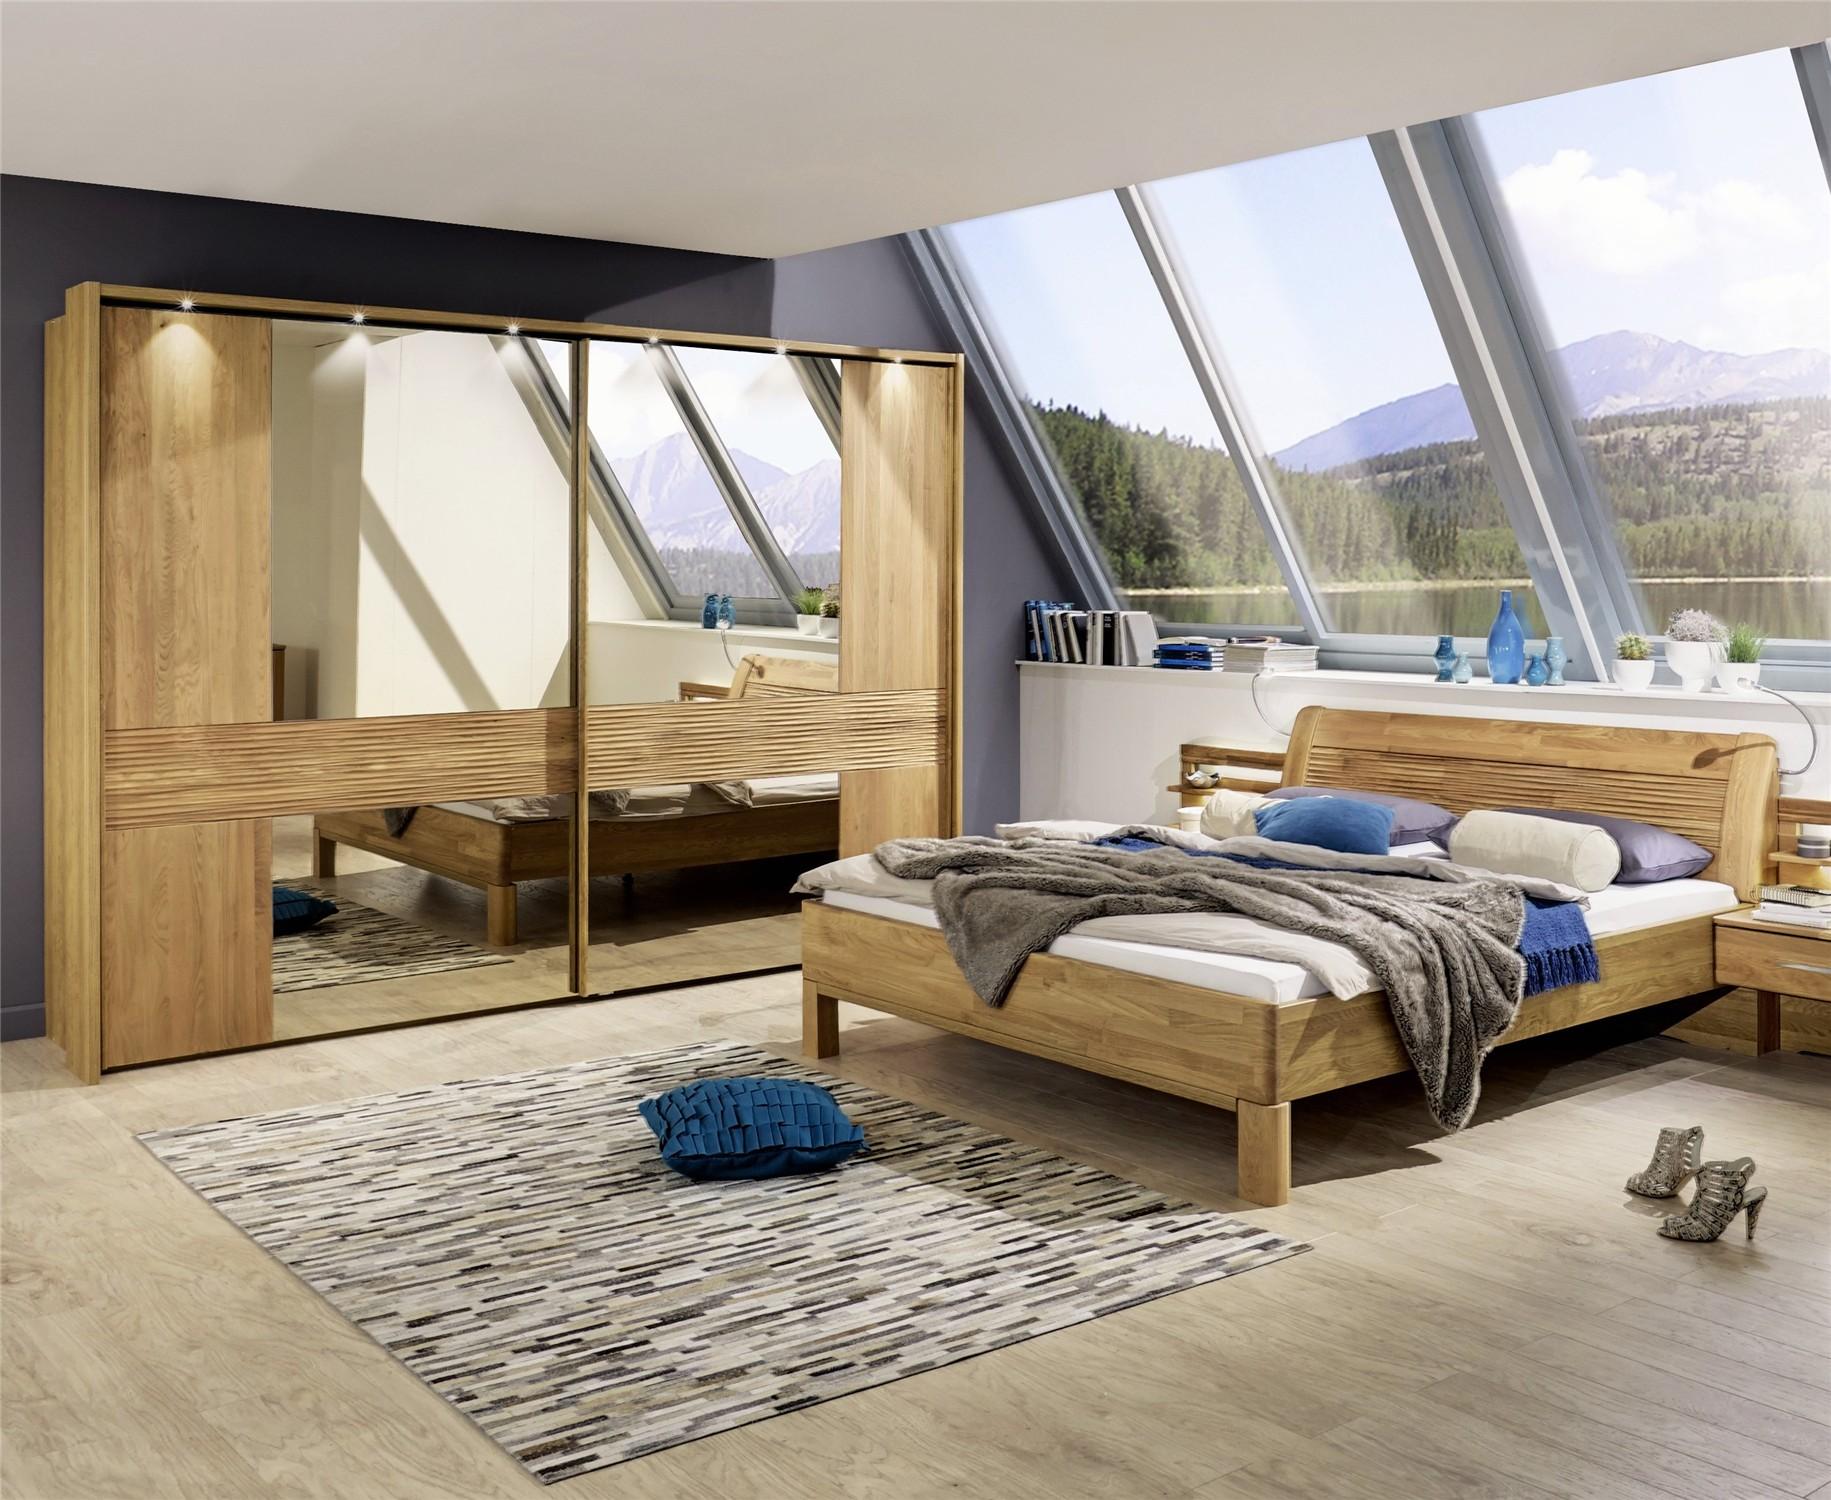 Stylform IRIS - 9-9cm Wardrobe Bedroom Set